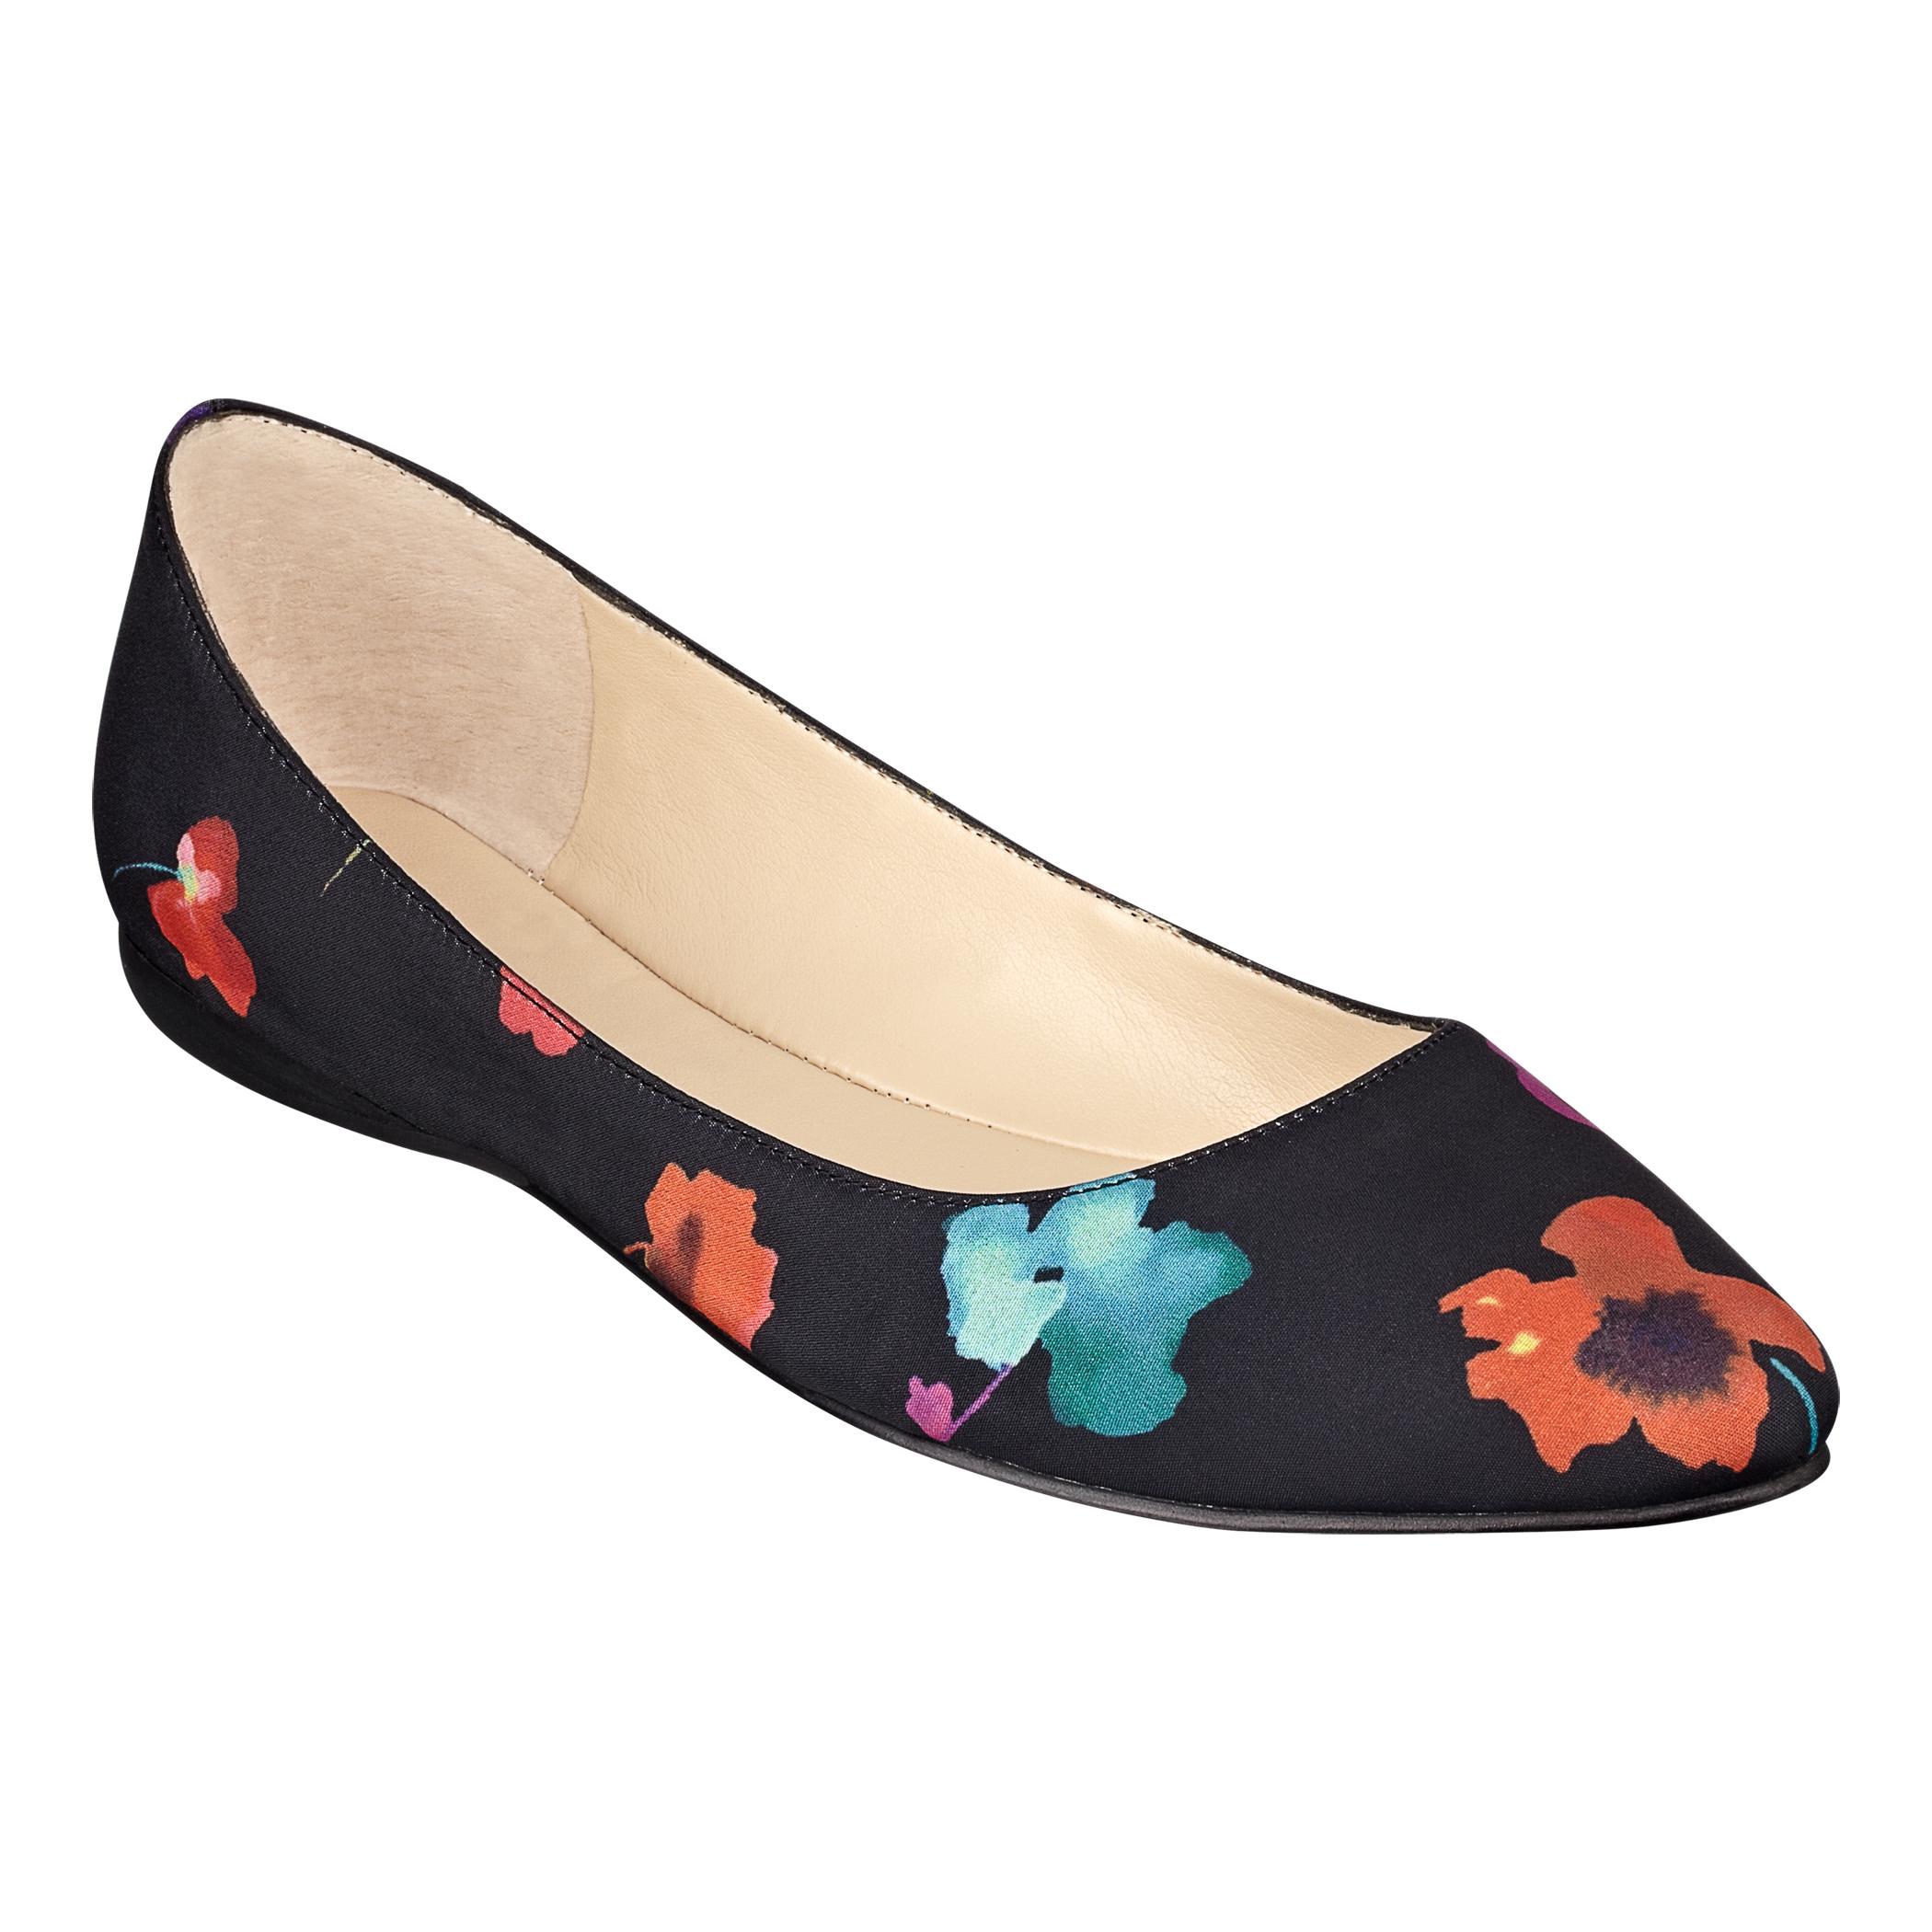 Stylish Women s Flats Shoes Nine West SpeakUp Women Orange Multi SatinBuy shoes